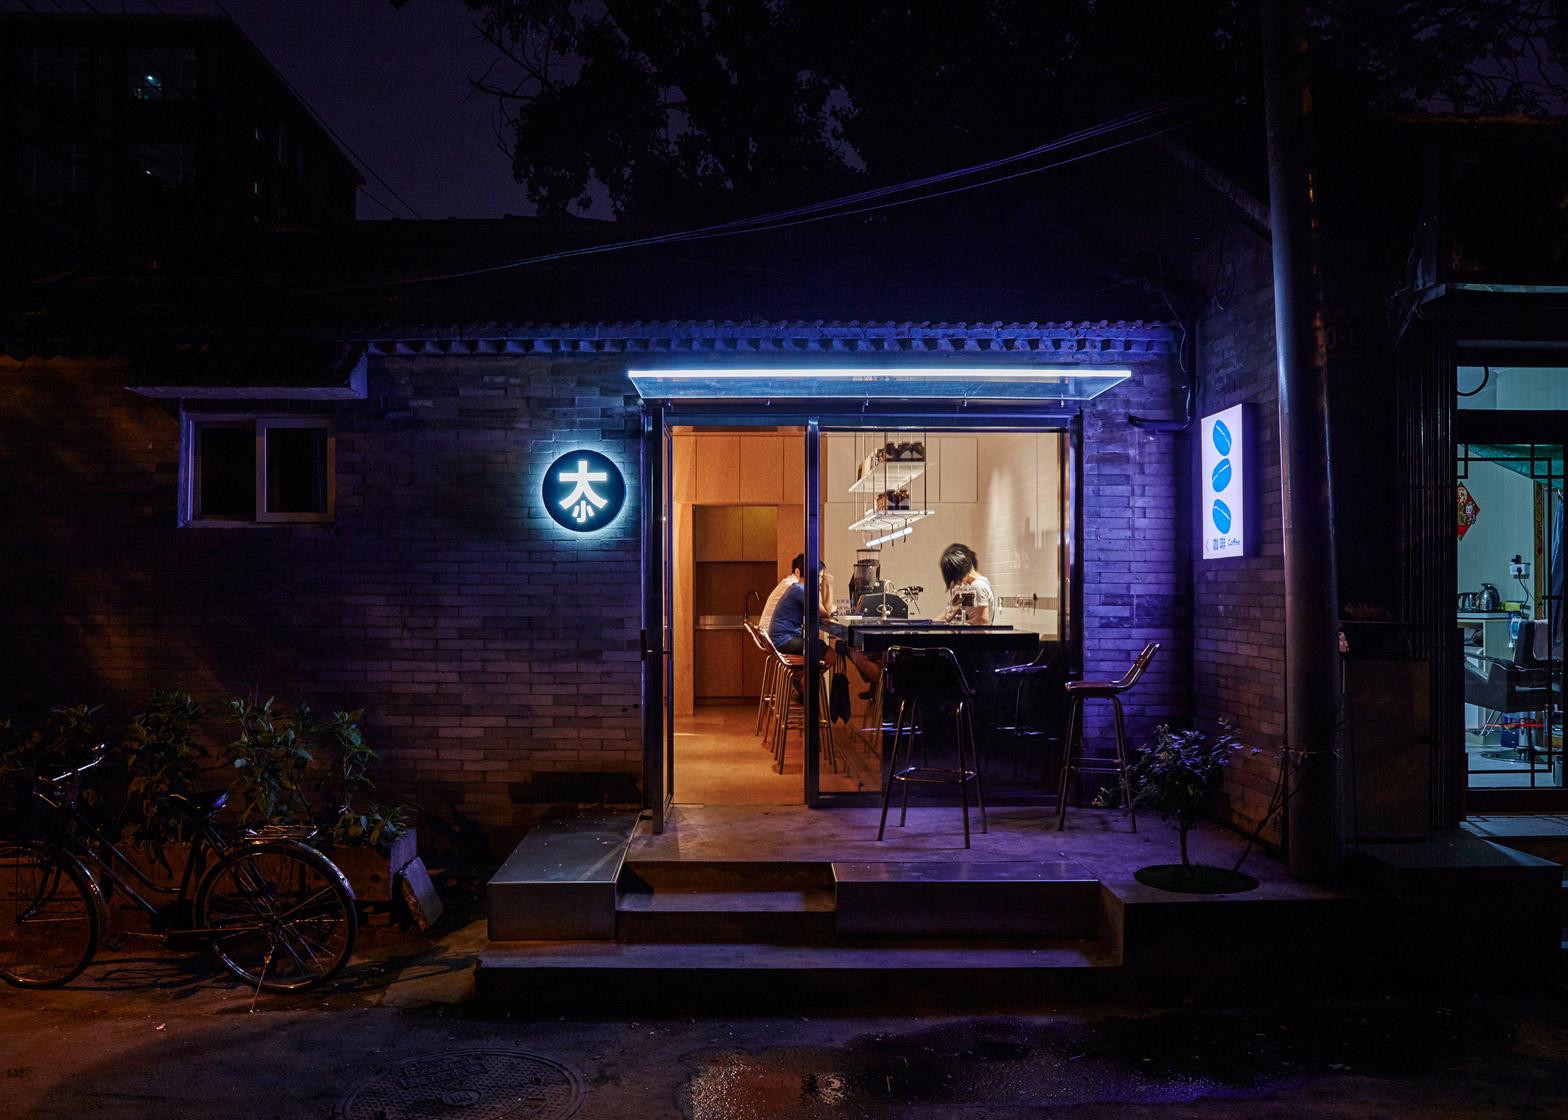 big-small-coffee-bar-b-and-b-guest-room-hutong-office-aio-beijing-cork_dezeen_1568_6